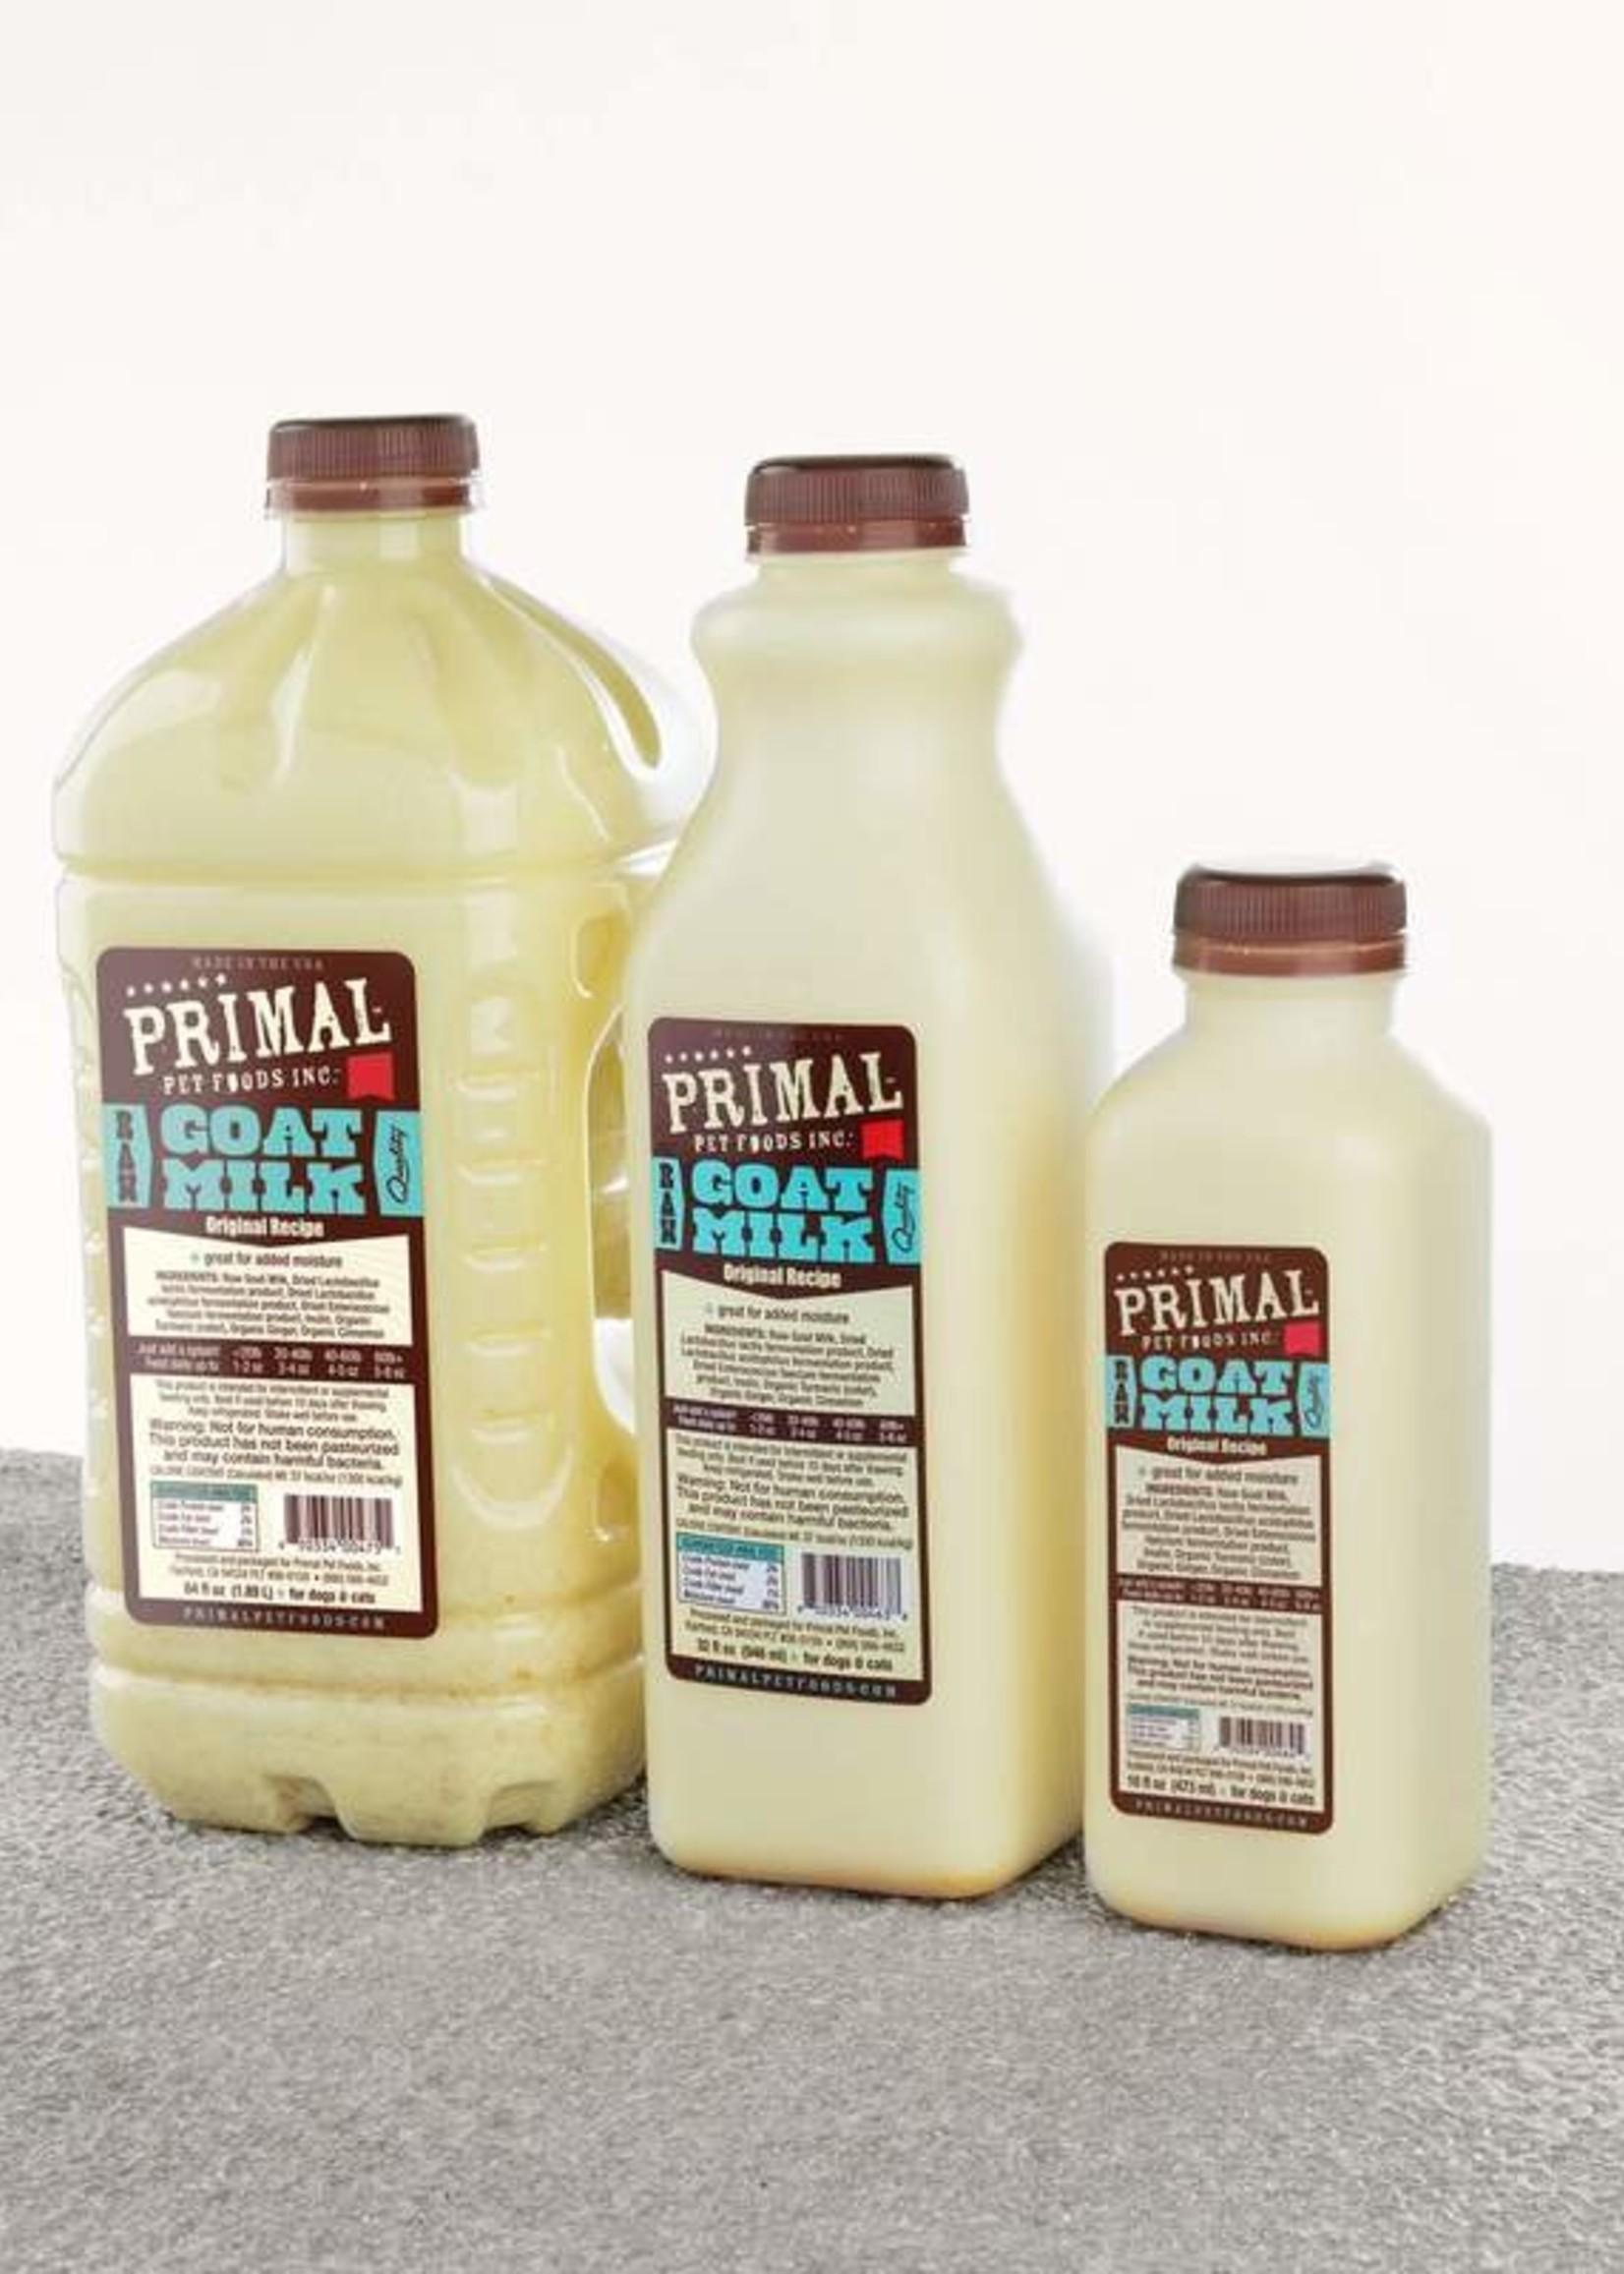 Primal Pet Foods Inc.™ Primal Original Raw Goat Milk 16oz